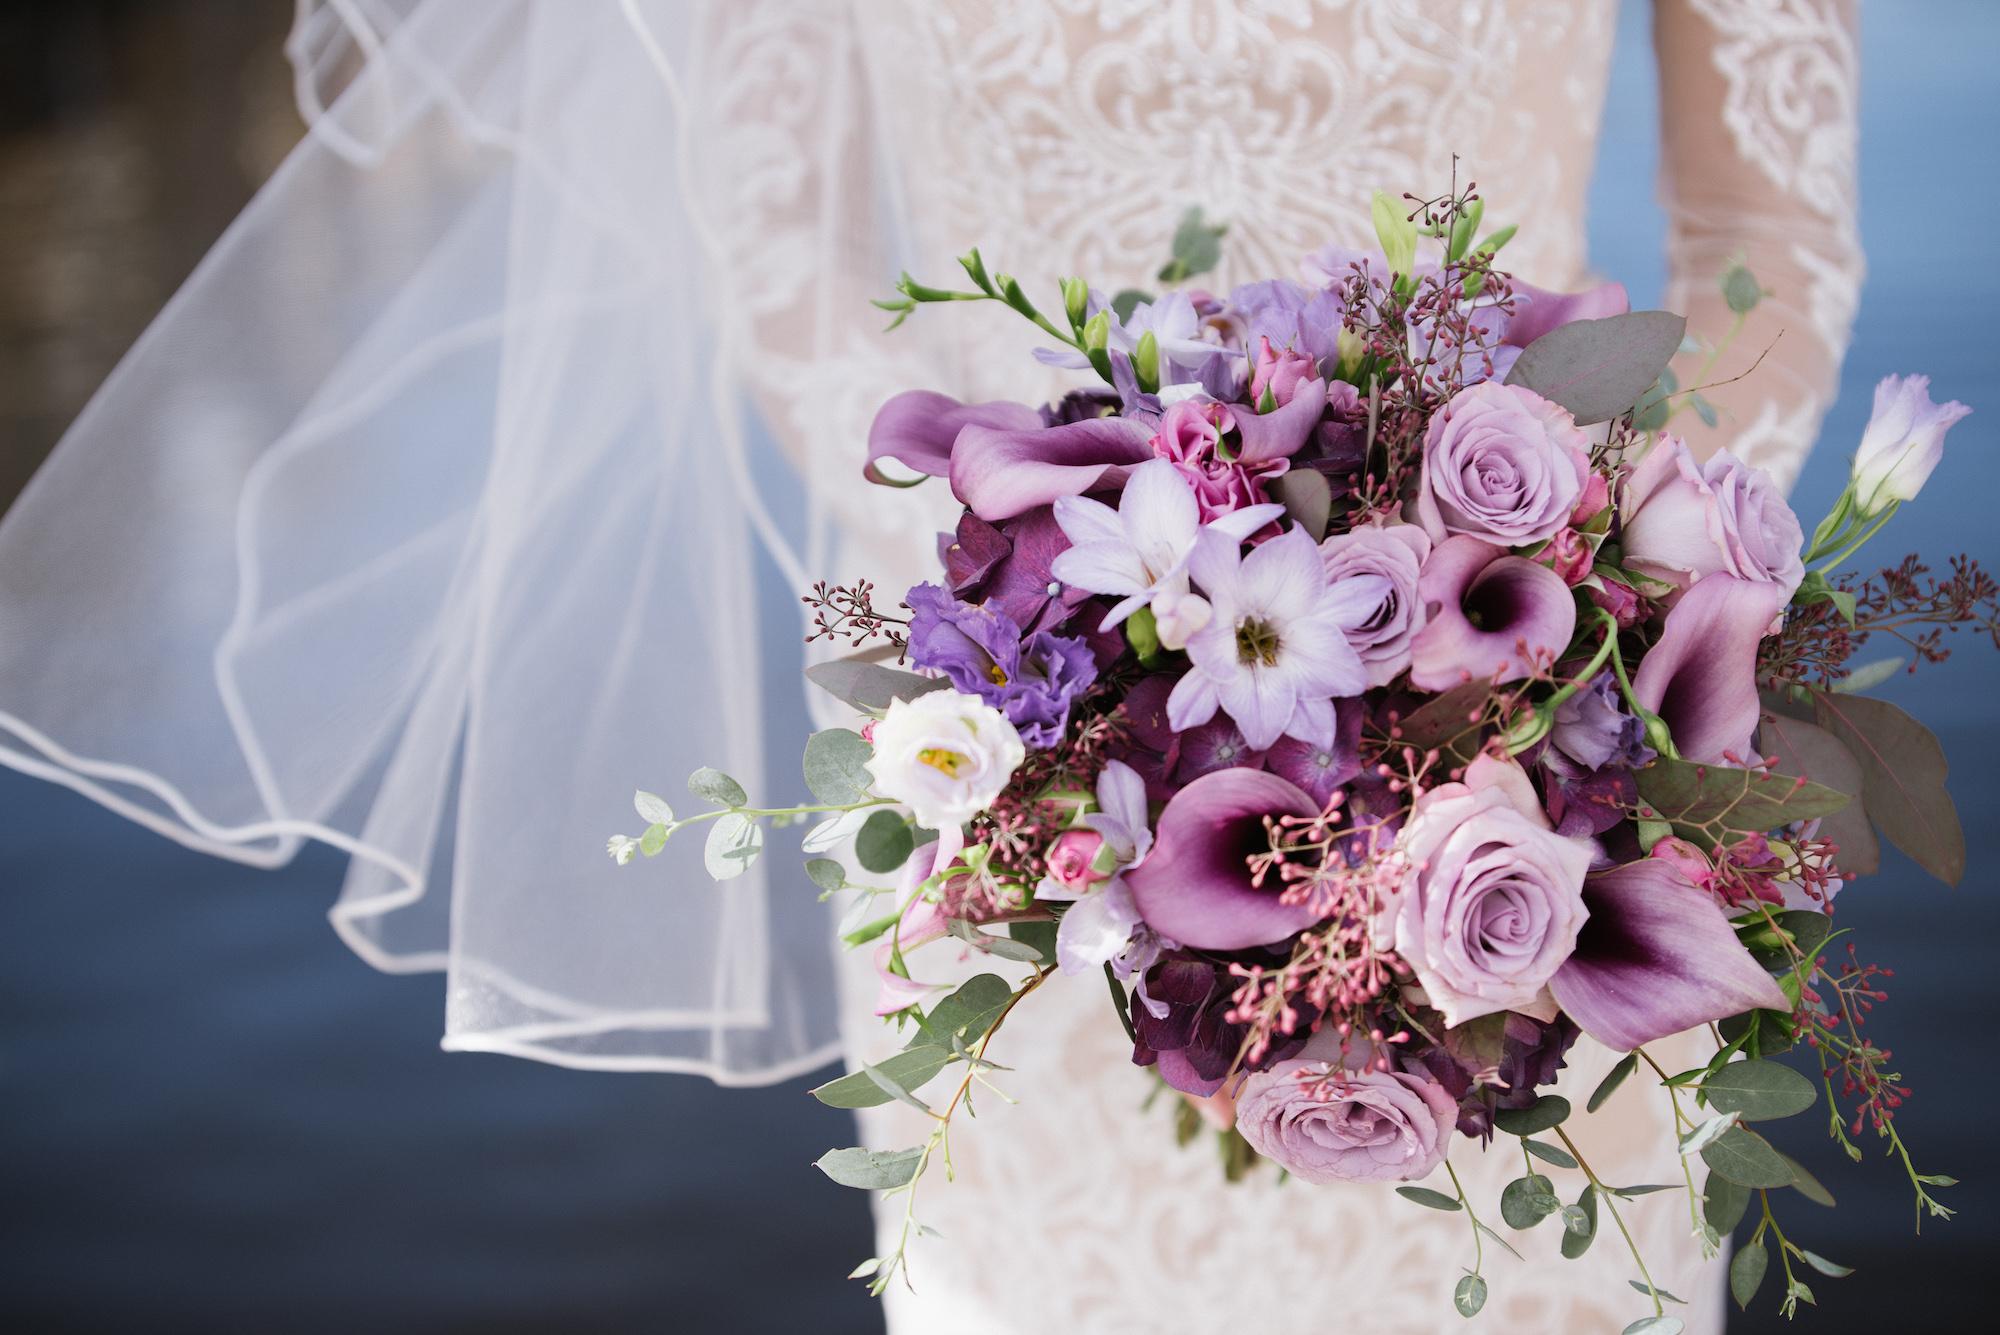 purple wedding bouquet   Dillinger Studios Minneapolis Photographer   Mexican American fusion wedding   Sixpence Events & Planning Minnesota wedding planner .jpg